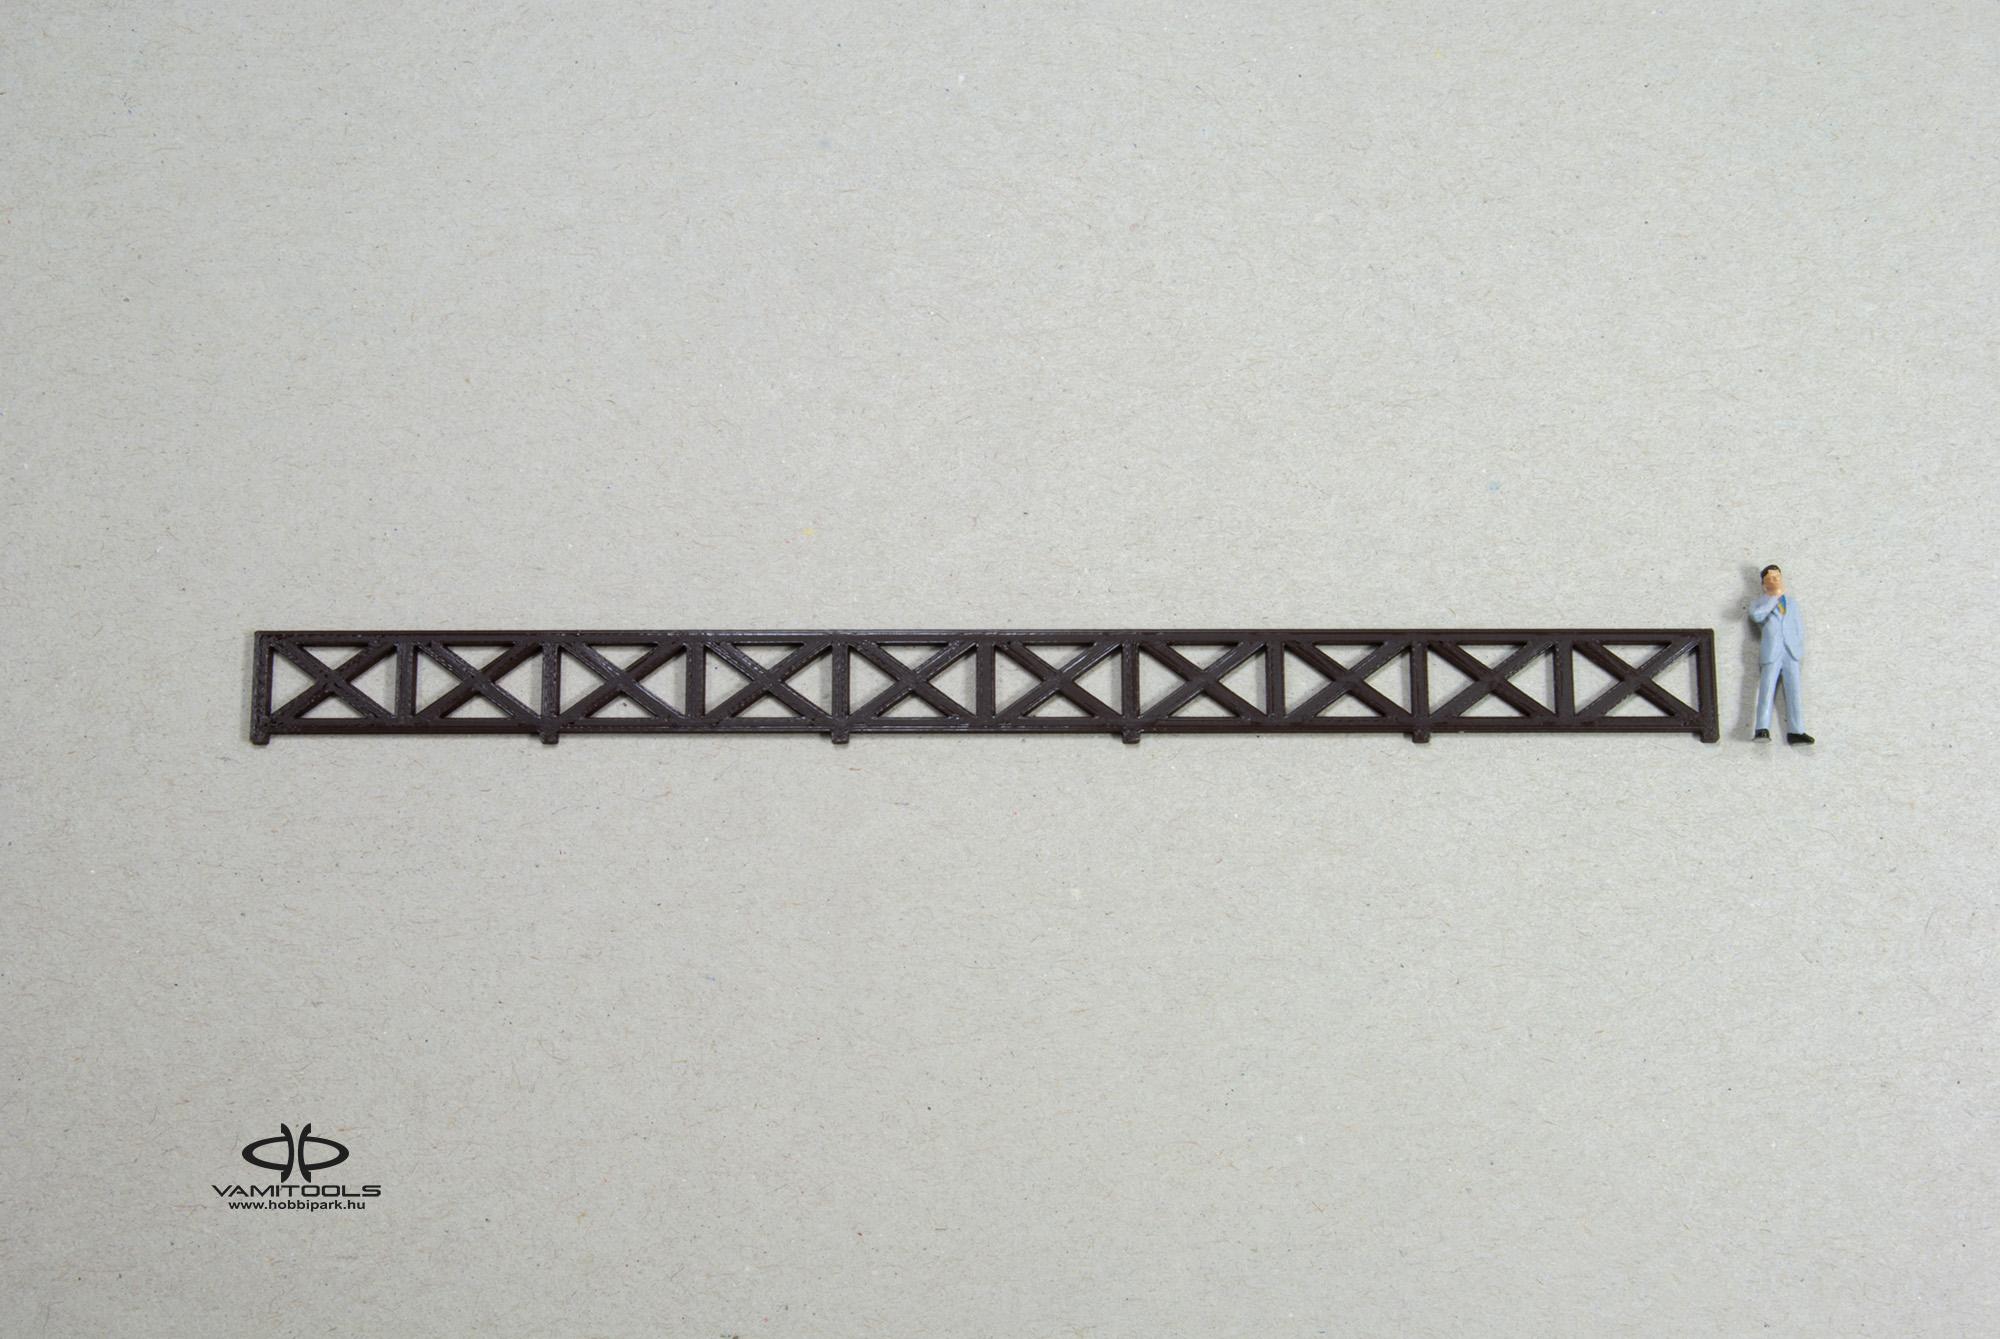 kerítés, beton kerítés, betonkerítés, vasúti betonkerítés, vasúti kerítés, MÁV kerítés, MÁV betonkerítés, vasbeton kerítés, áttört vasbeton kerítés, MÁV vasbeton kerítés, MÁV áttört vasbeton kerítés, H0 kerítés, H0 beton kerítés, H0 betonkerítés, H0 vasúti betonkerítés, H0 vasúti kerítés, H0 MÁV kerítés, H0 MÁV betonkerítés, H0 vasbeton kerítés, H0 áttört vasbeton kerítés, H0 MÁV vasbeton kerítés, H0 MÁV áttört vasbeton kerítés, 1:87 kerítés, 1:87 beton kerítés, 1:87 betonkerítés, 1:87 vasúti betonkerítés, 1:87 vasúti kerítés, 1:87 MÁV kerítés, 1:87 MÁV betonkerítés, 1:87 vasbeton kerítés, 1:87 áttört vasbeton kerítés, 1:87 MÁV vasbeton kerítés, 1:87 MÁV áttört vasbeton kerítés, TT kerítés, TT beton kerítés, TT betonkerítés, TT vasúti betonkerítés, TT vasúti kerítés, TT MÁV kerítés, TT MÁV betonkerítés, TT vasbeton kerítés, TT áttört vasbeton kerítés, TT MÁV vasbeton kerítés, TT MÁV áttört vasbeton kerítés, 1:120 kerítés, 1:120 beton kerítés, 1:120 betonkerítés, 1:120 vasúti betonkerítés, 1:120 vasúti kerítés, 1:120 MÁV kerítés, 1:120 MÁV betonkerítés, 1:120 vasbeton kerítés, 1:120 áttört vasbeton kerítés, 1:120 MÁV vasbeton kerítés, 1:120 MÁV áttört vasbeton kerítés, N kerítés, N beton kerítés, N betonkerítés, N vasúti betonkerítés, N vasúti kerítés, N MÁV kerítés, N MÁV betonkerítés, N vasbeton kerítés, N áttört vasbeton kerítés, N MÁV vasbeton kerítés, N MÁV áttört vasbeton kerítés, 1:160 kerítés, 1:160 beton kerítés, 1:160 betonkerítés, 1:160 vasúti betonkerítés, 1:160 vasúti kerítés, 1:160 MÁV kerítés, 1:160 MÁV betonkerítés, 1:160 vasbeton kerítés, 1:160 áttört vasbeton kerítés, 1:160 MÁV vasbeton kerítés, 1:160 MÁV áttört vasbeton kerítés, modell kerítés, modell beton kerítés, modell betonkerítés, modell vasúti betonkerítés, modell vasúti kerítés, modell MÁV kerítés, modell MÁV betonkerítés, modell vasbeton kerítés, modell áttört vasbeton kerítés, modell MÁV vasbeton kerítés, modell MÁV áttört vasbeton kerítés, makett kerítés, makett beton kerítés, makett bet